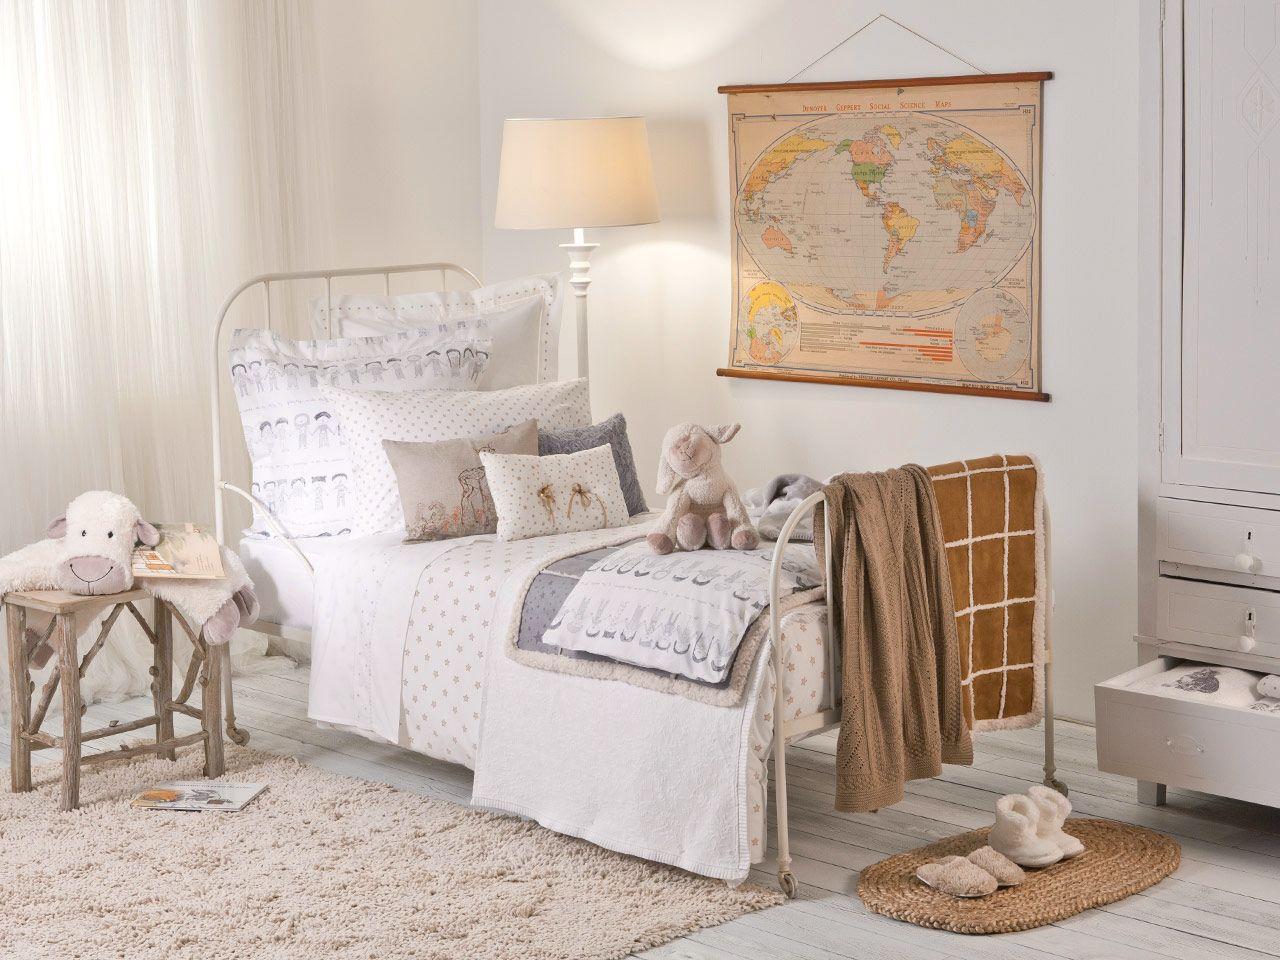 zara home kids a place for kids zara home kids zara. Black Bedroom Furniture Sets. Home Design Ideas